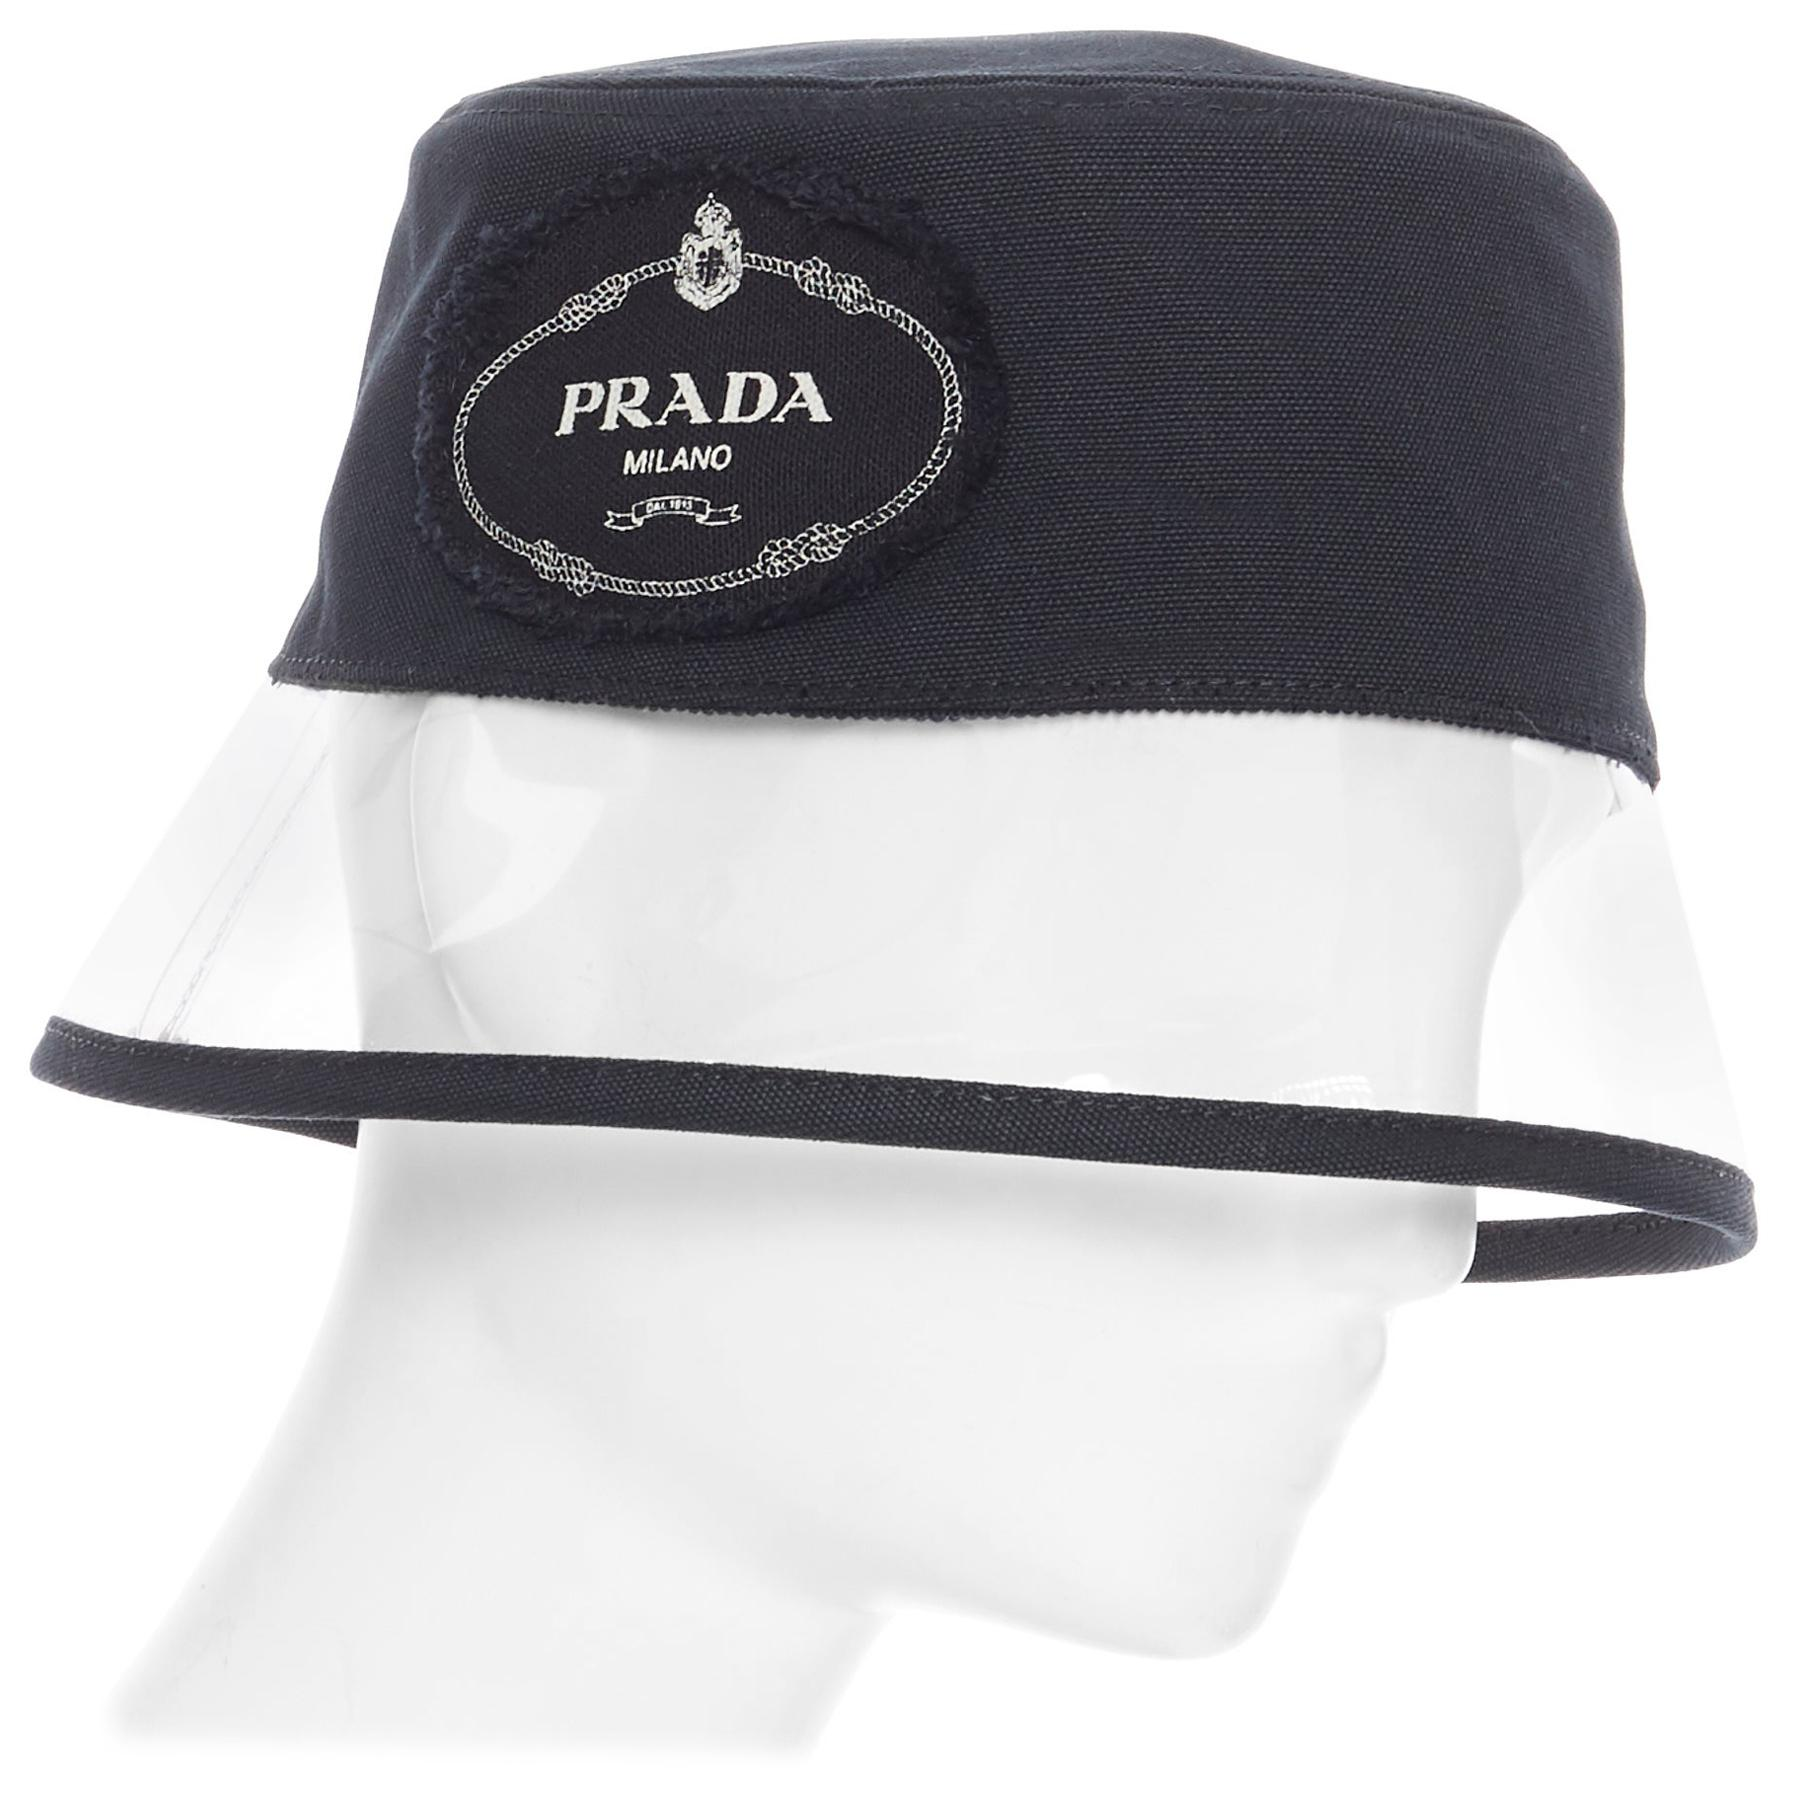 new PRADA 2018 black cotton frayed logo clear PVC brim shield 90's bucket hat S